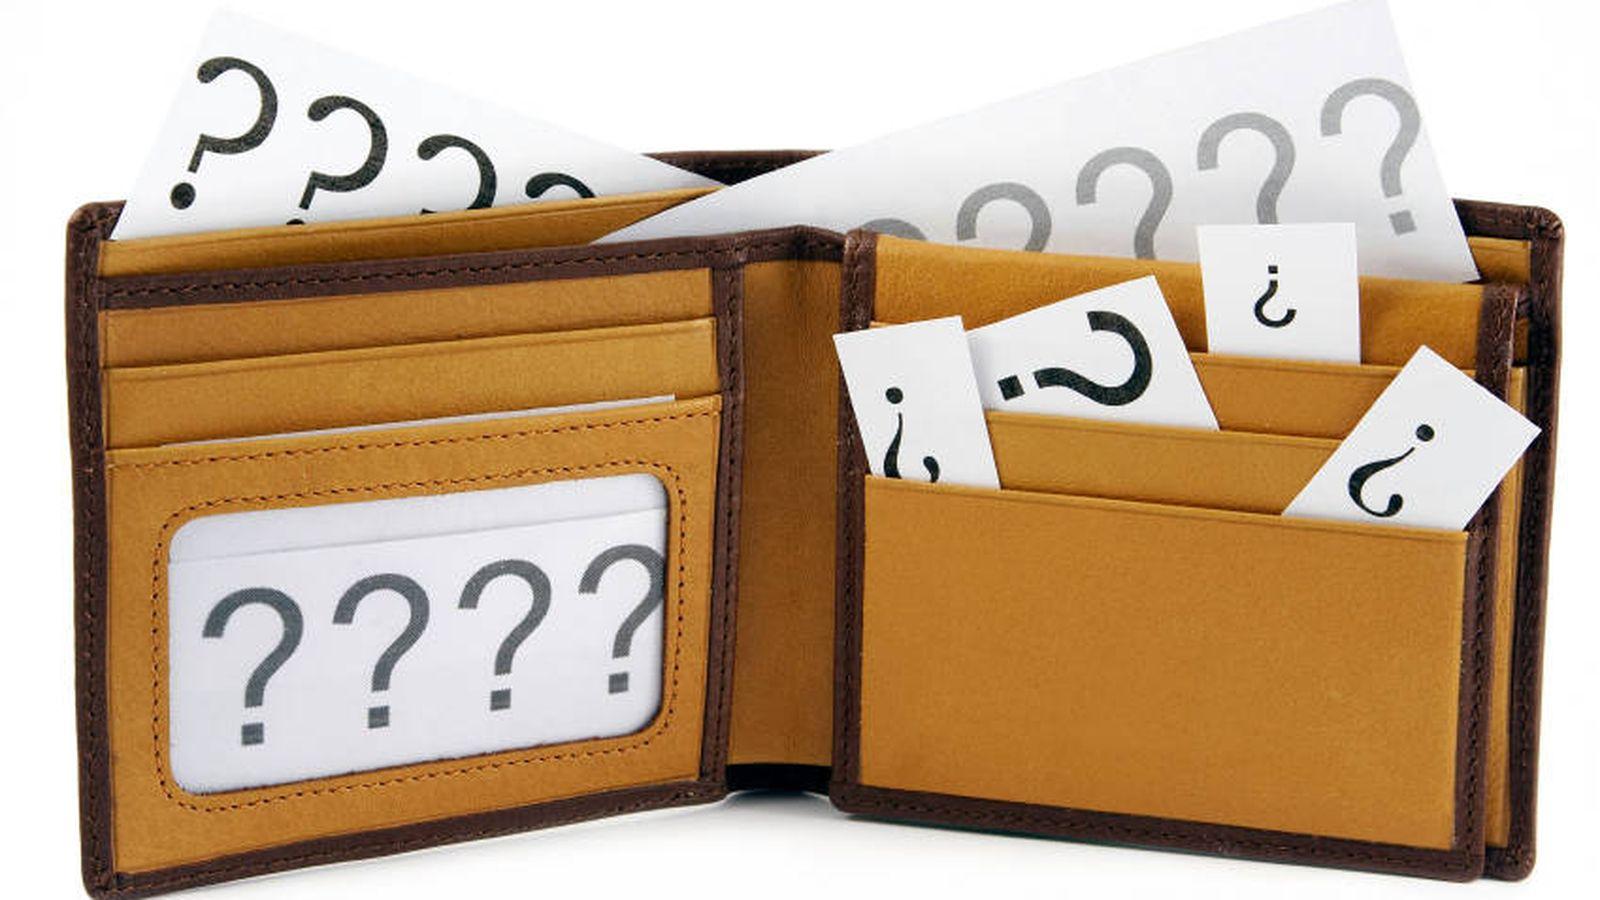 ab0d42aa1b Olvida la típica manera de estructurar una cartera de inversiones